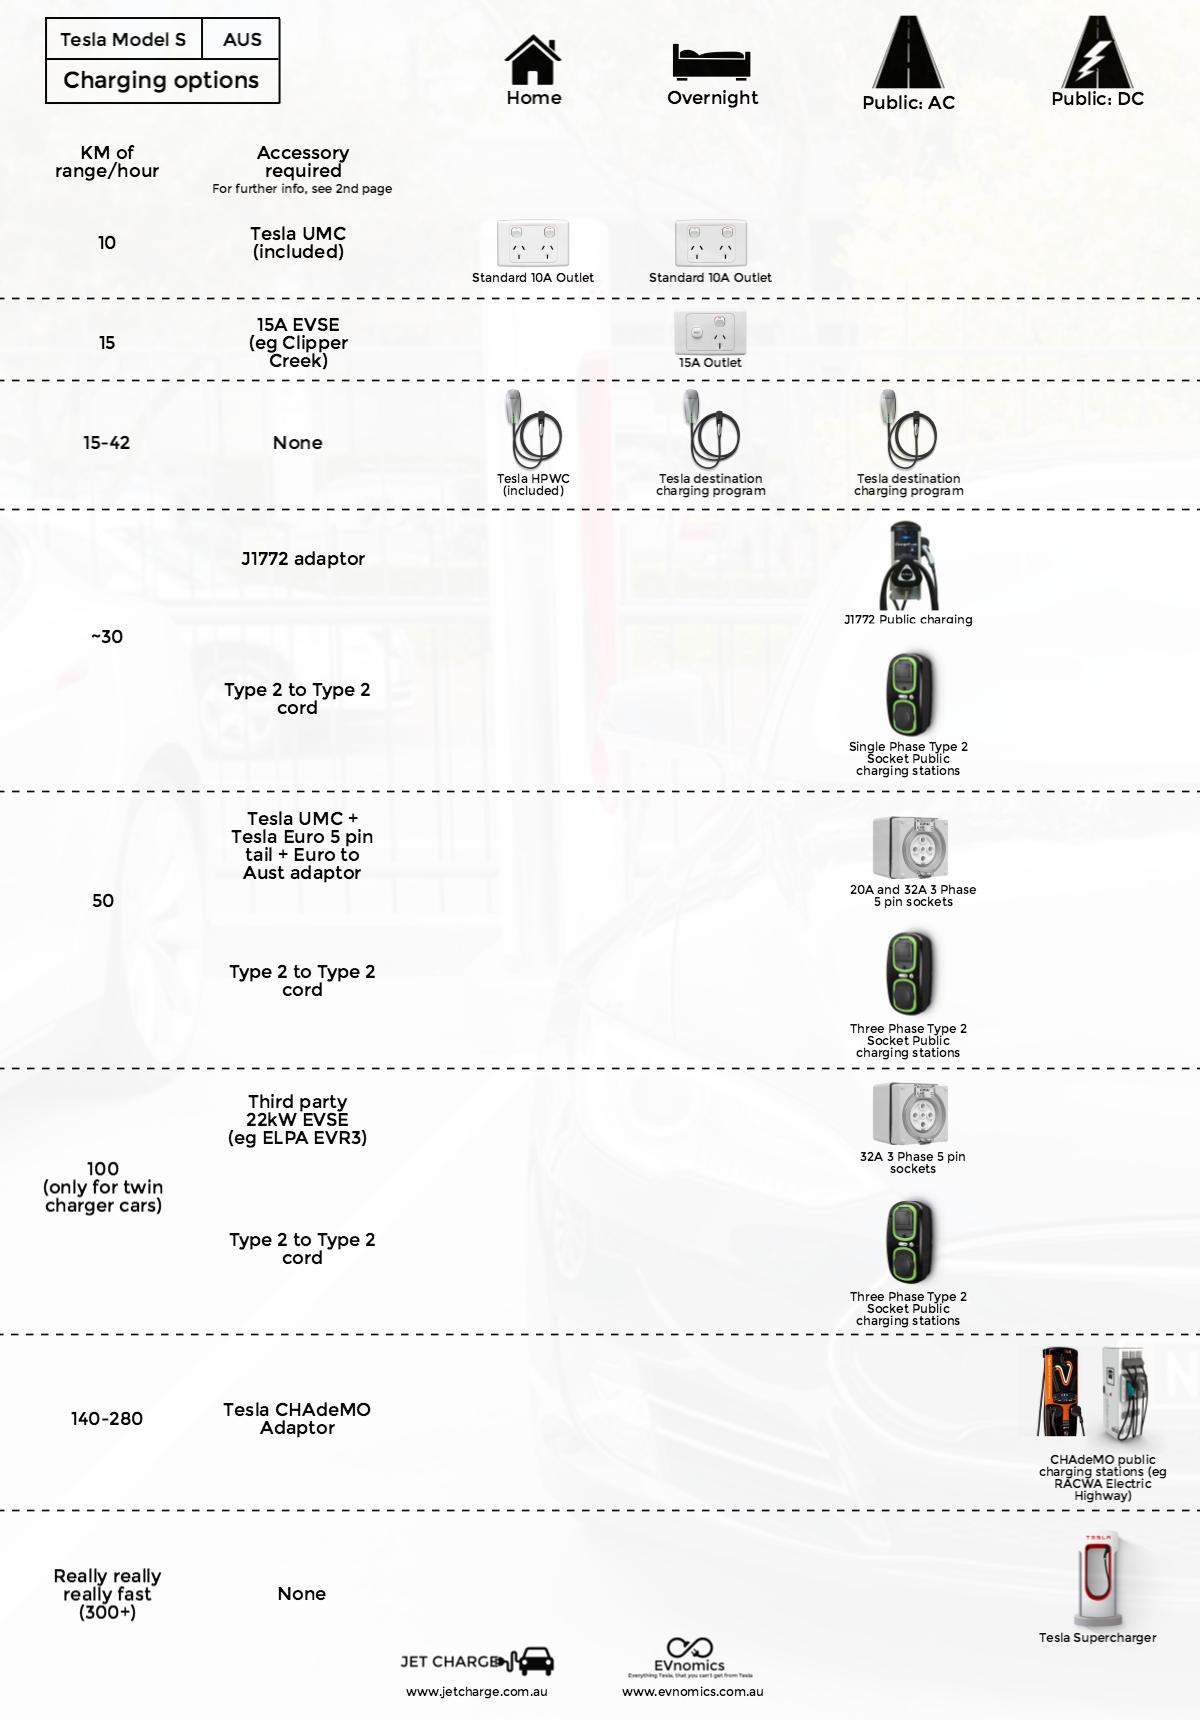 tesla-charging-infographic_20160103222201_1451859721280_block_0.png